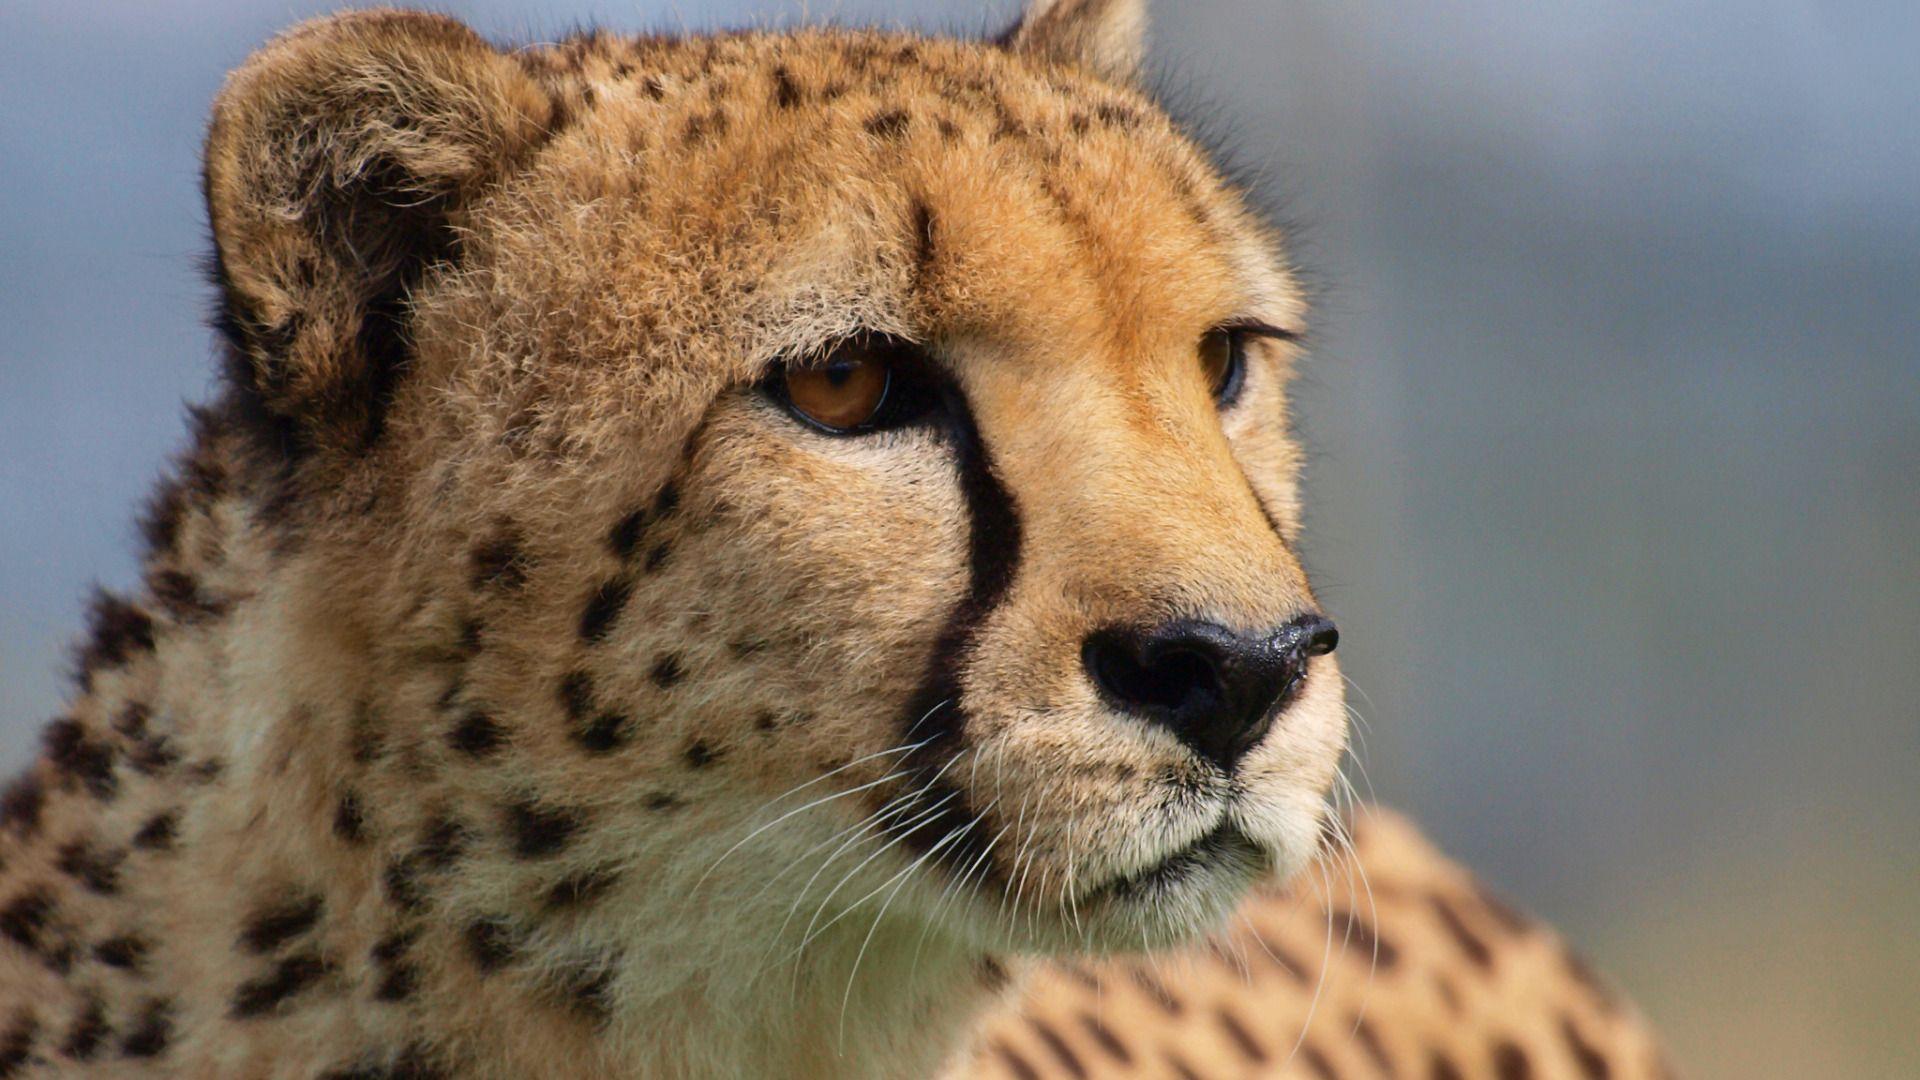 The Wallpapers Opinion, Predator, Big Cat, Cheetah